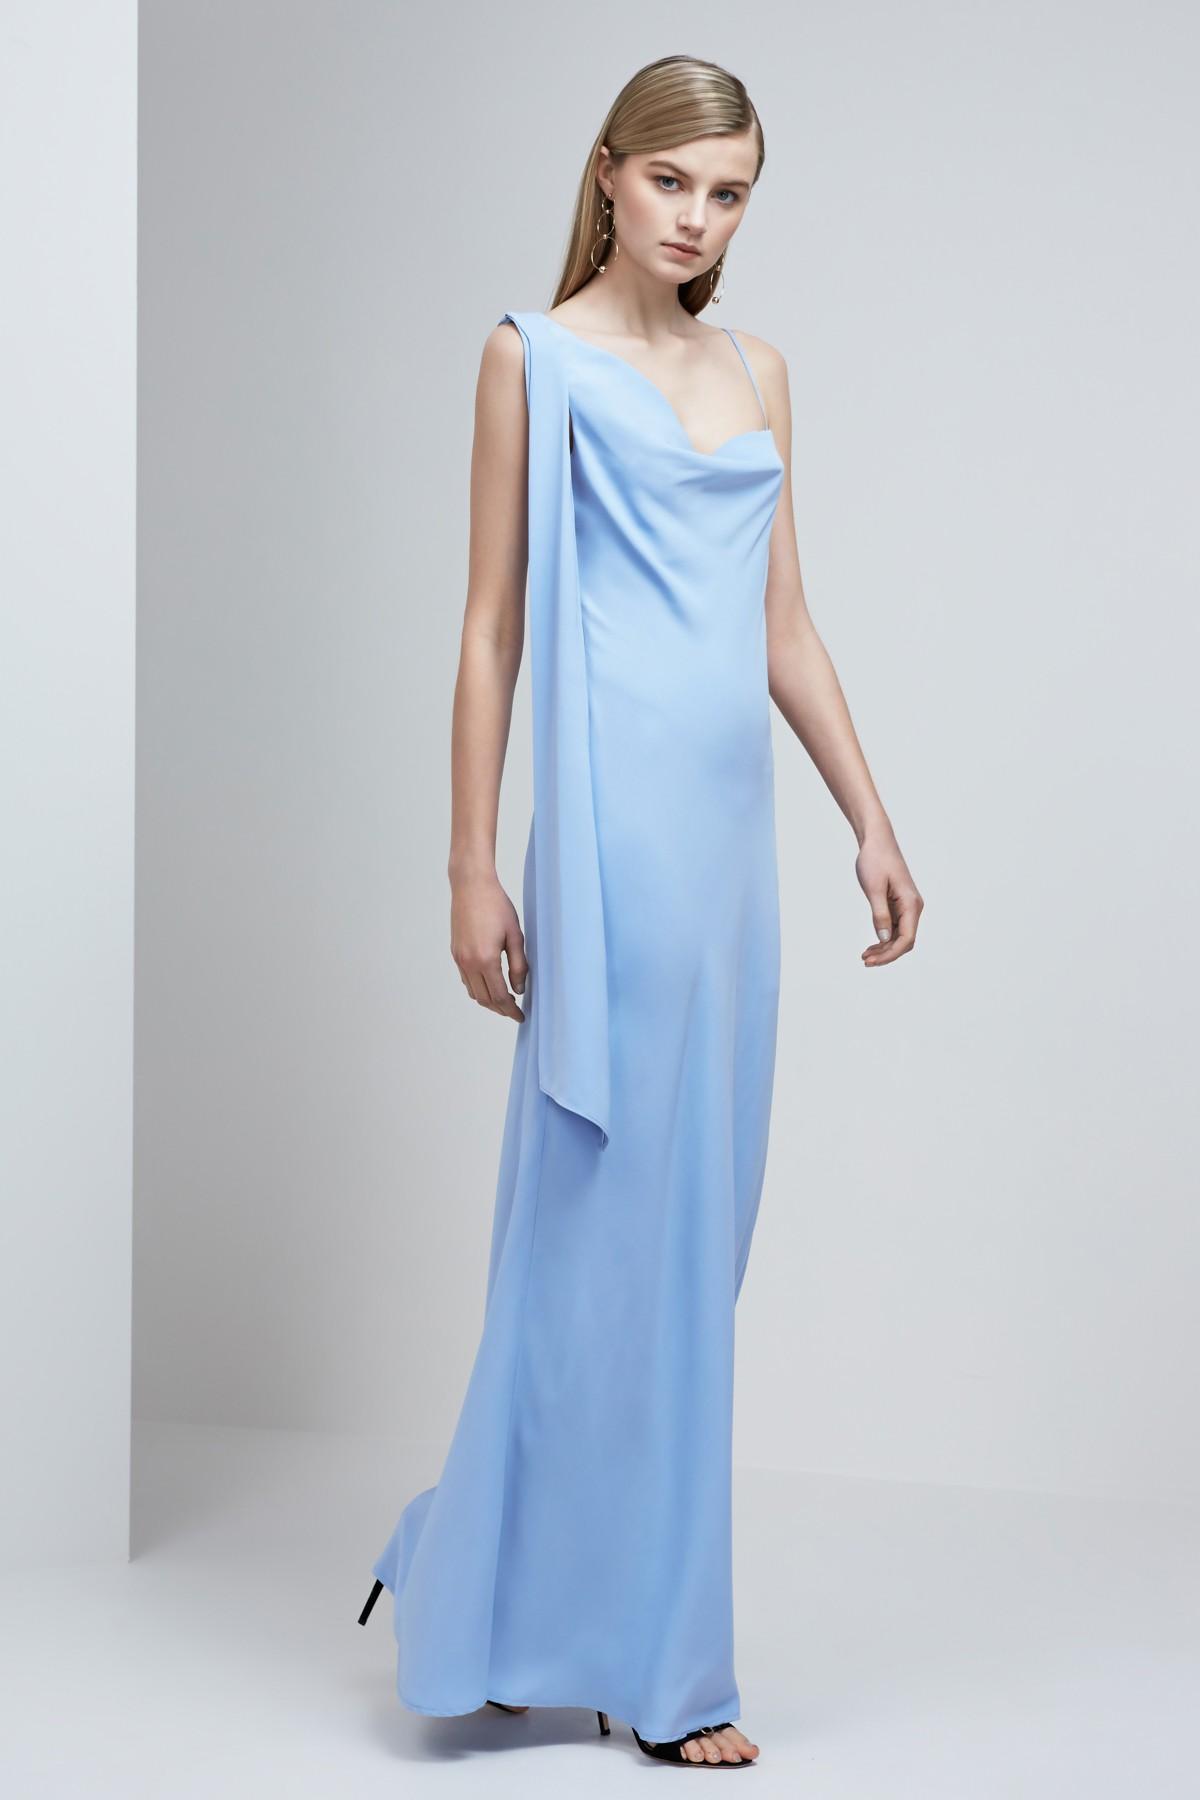 Shop Keepsake Needed Me Maxi Dress.